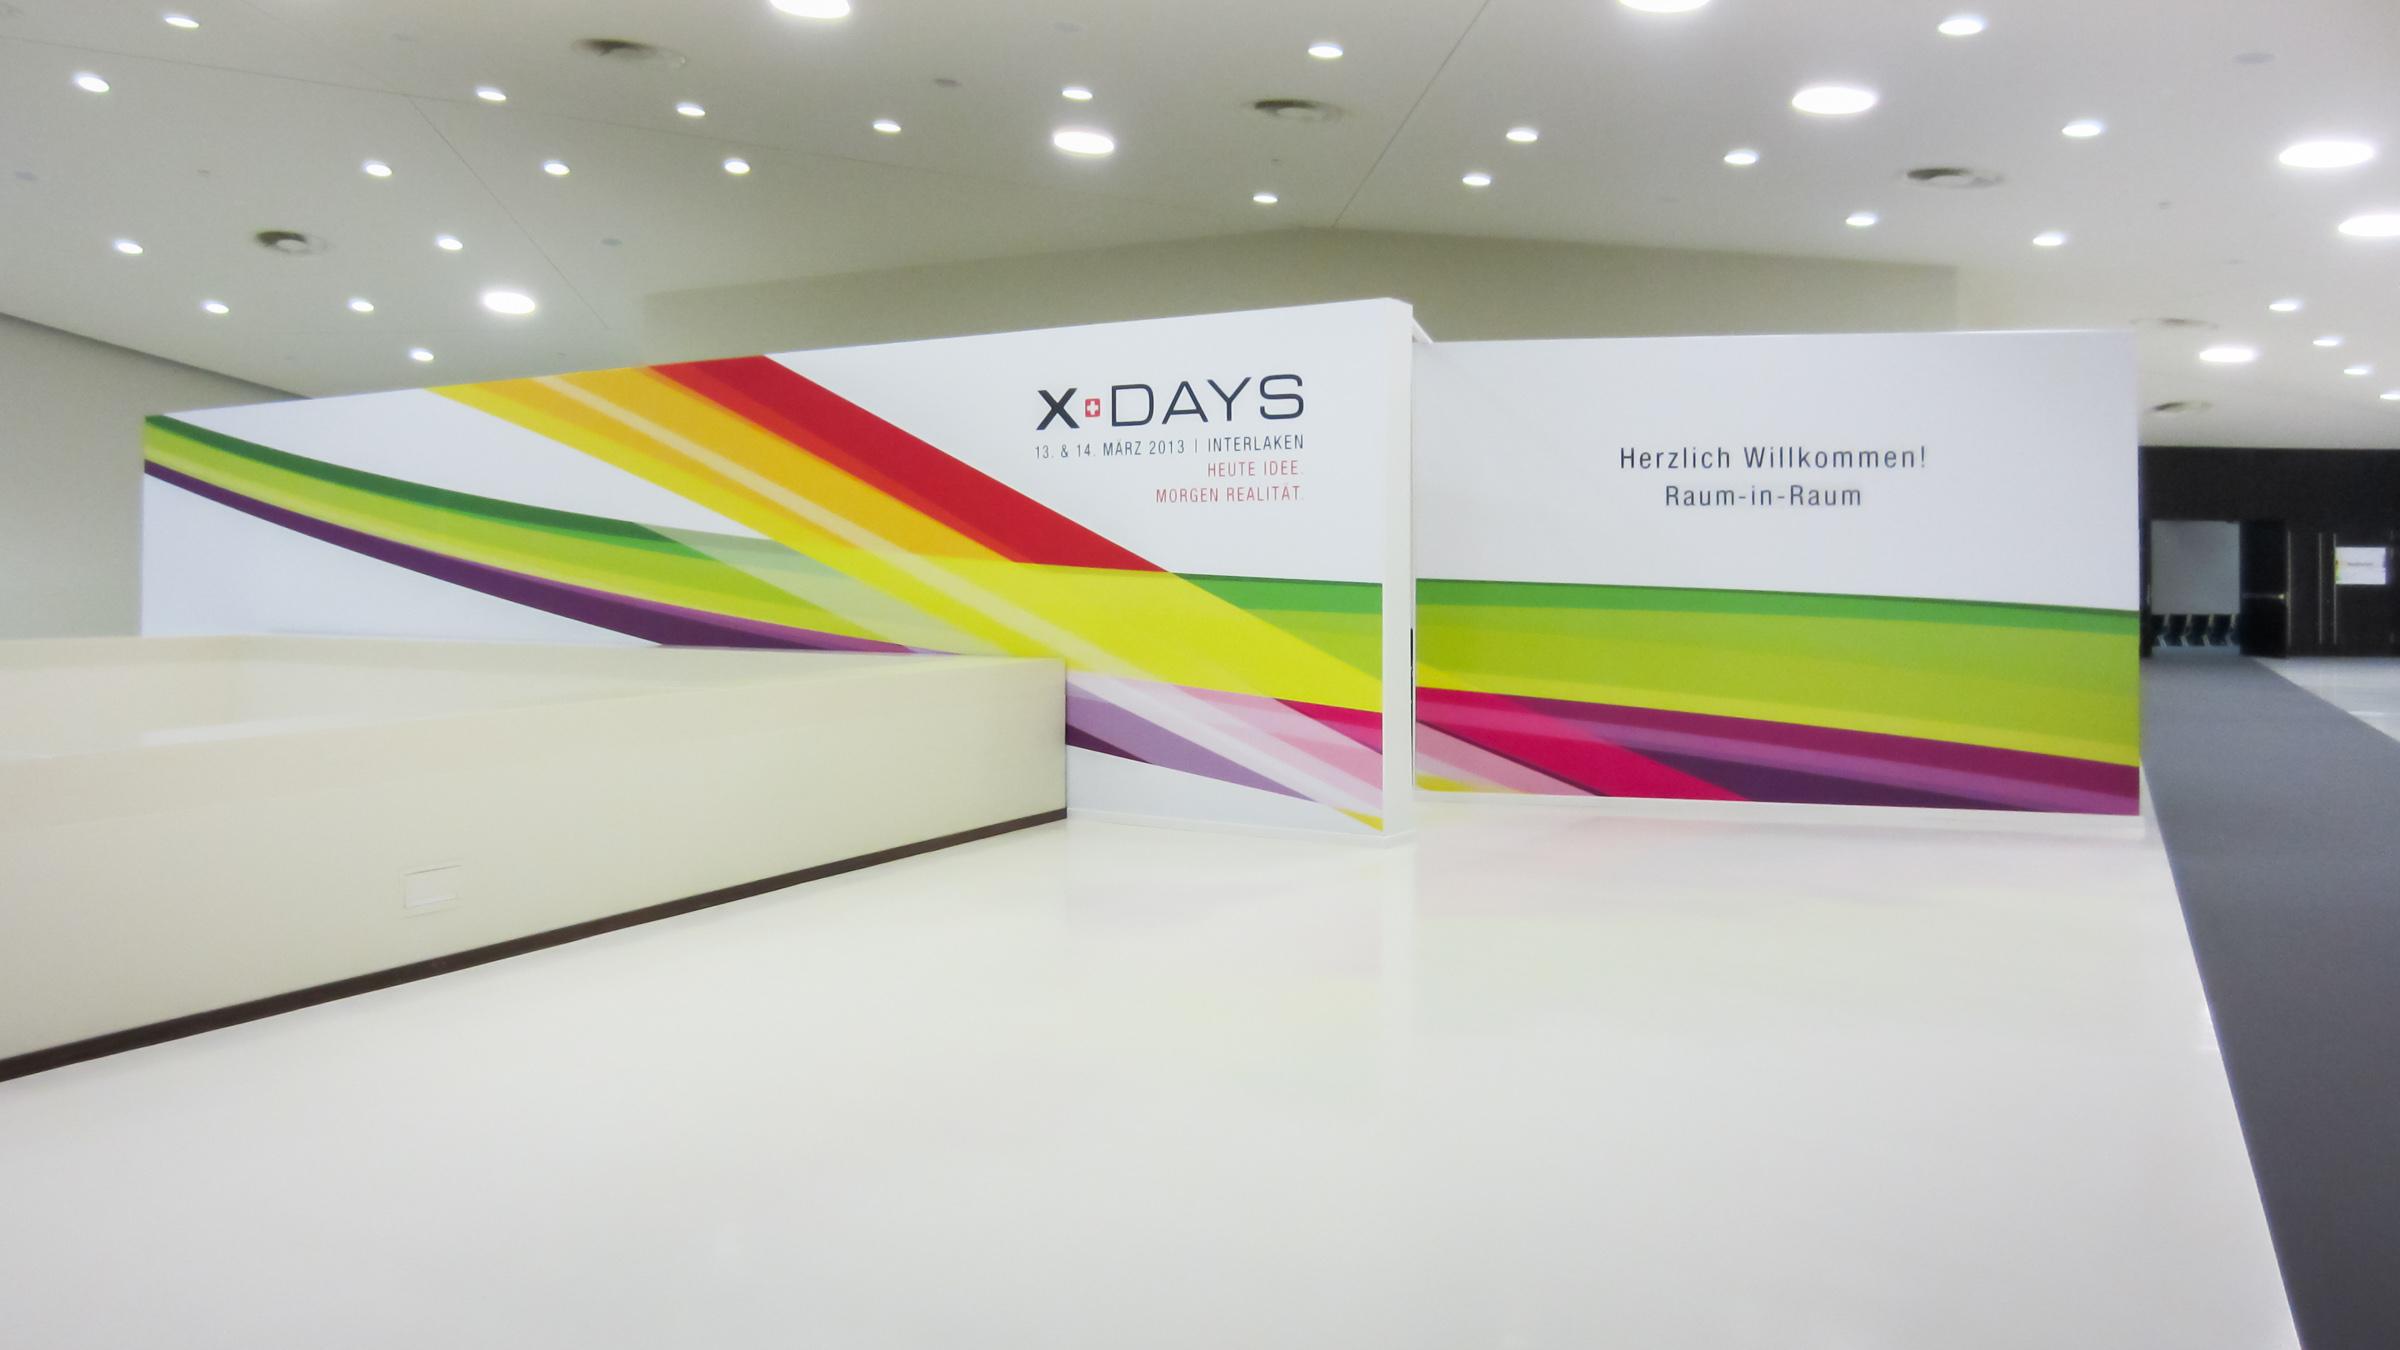 Microsoft - X-Days Interlaken